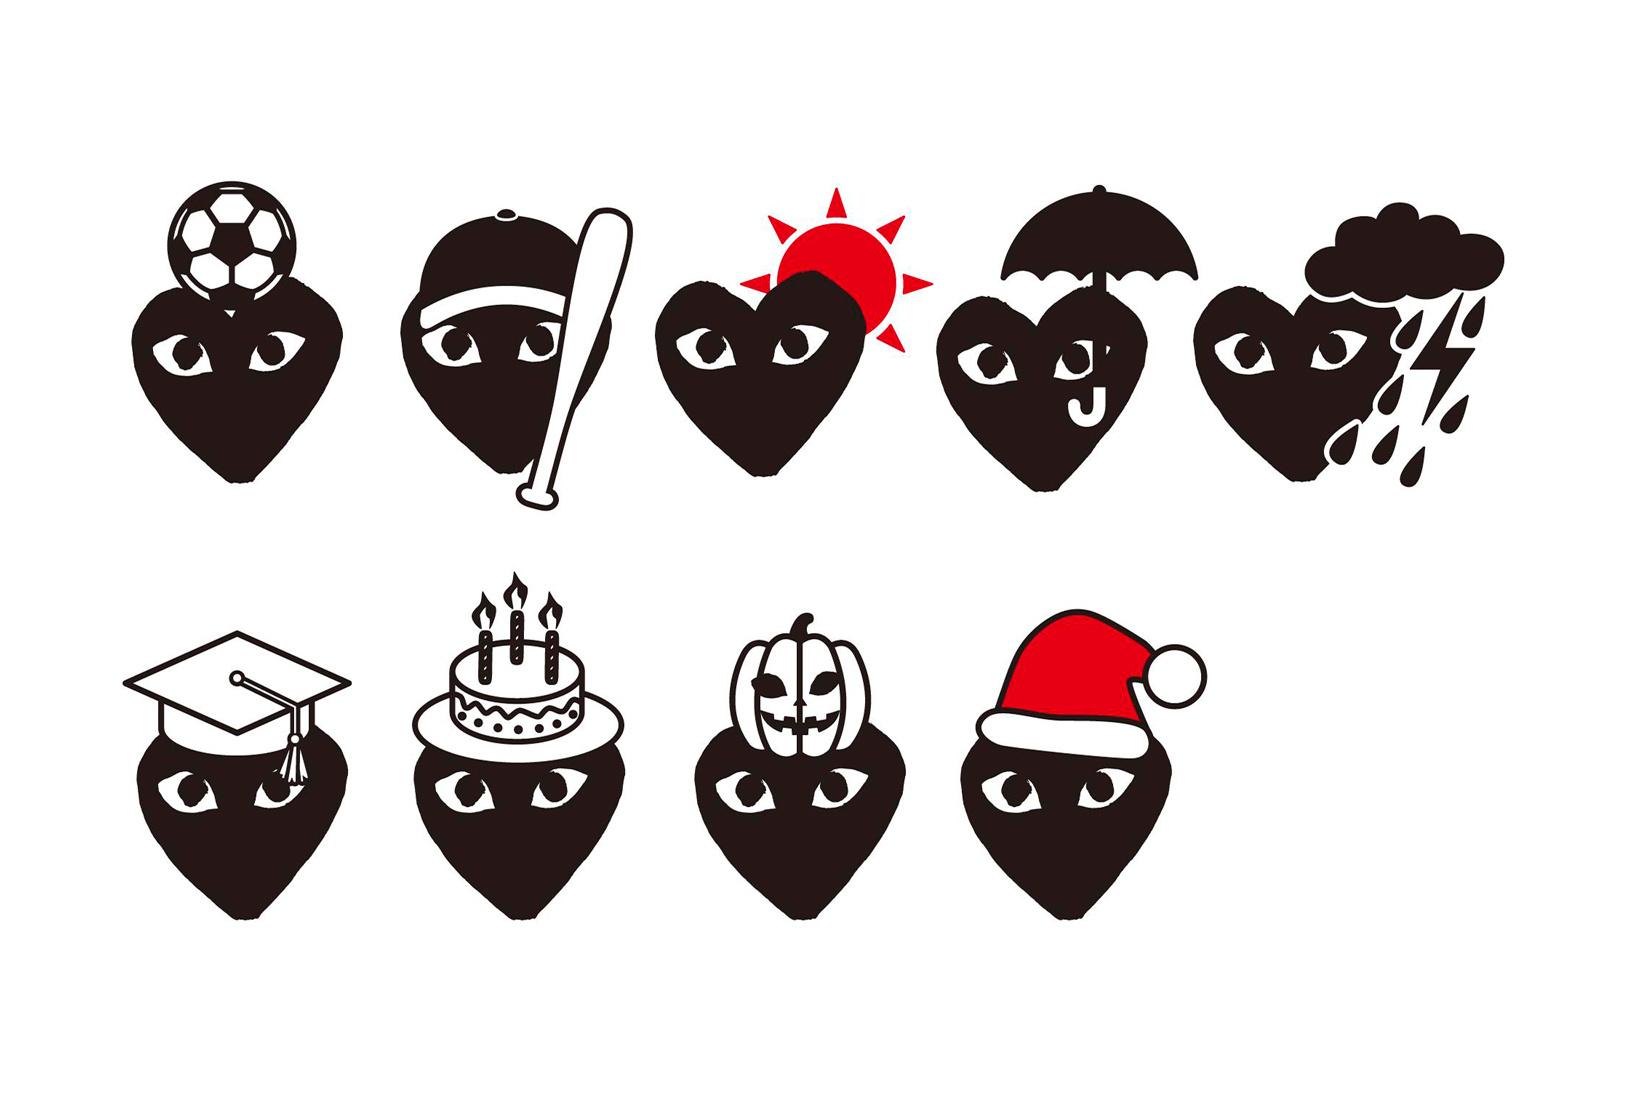 Comme des Garçons Emojis Pack - TRENDS periodical